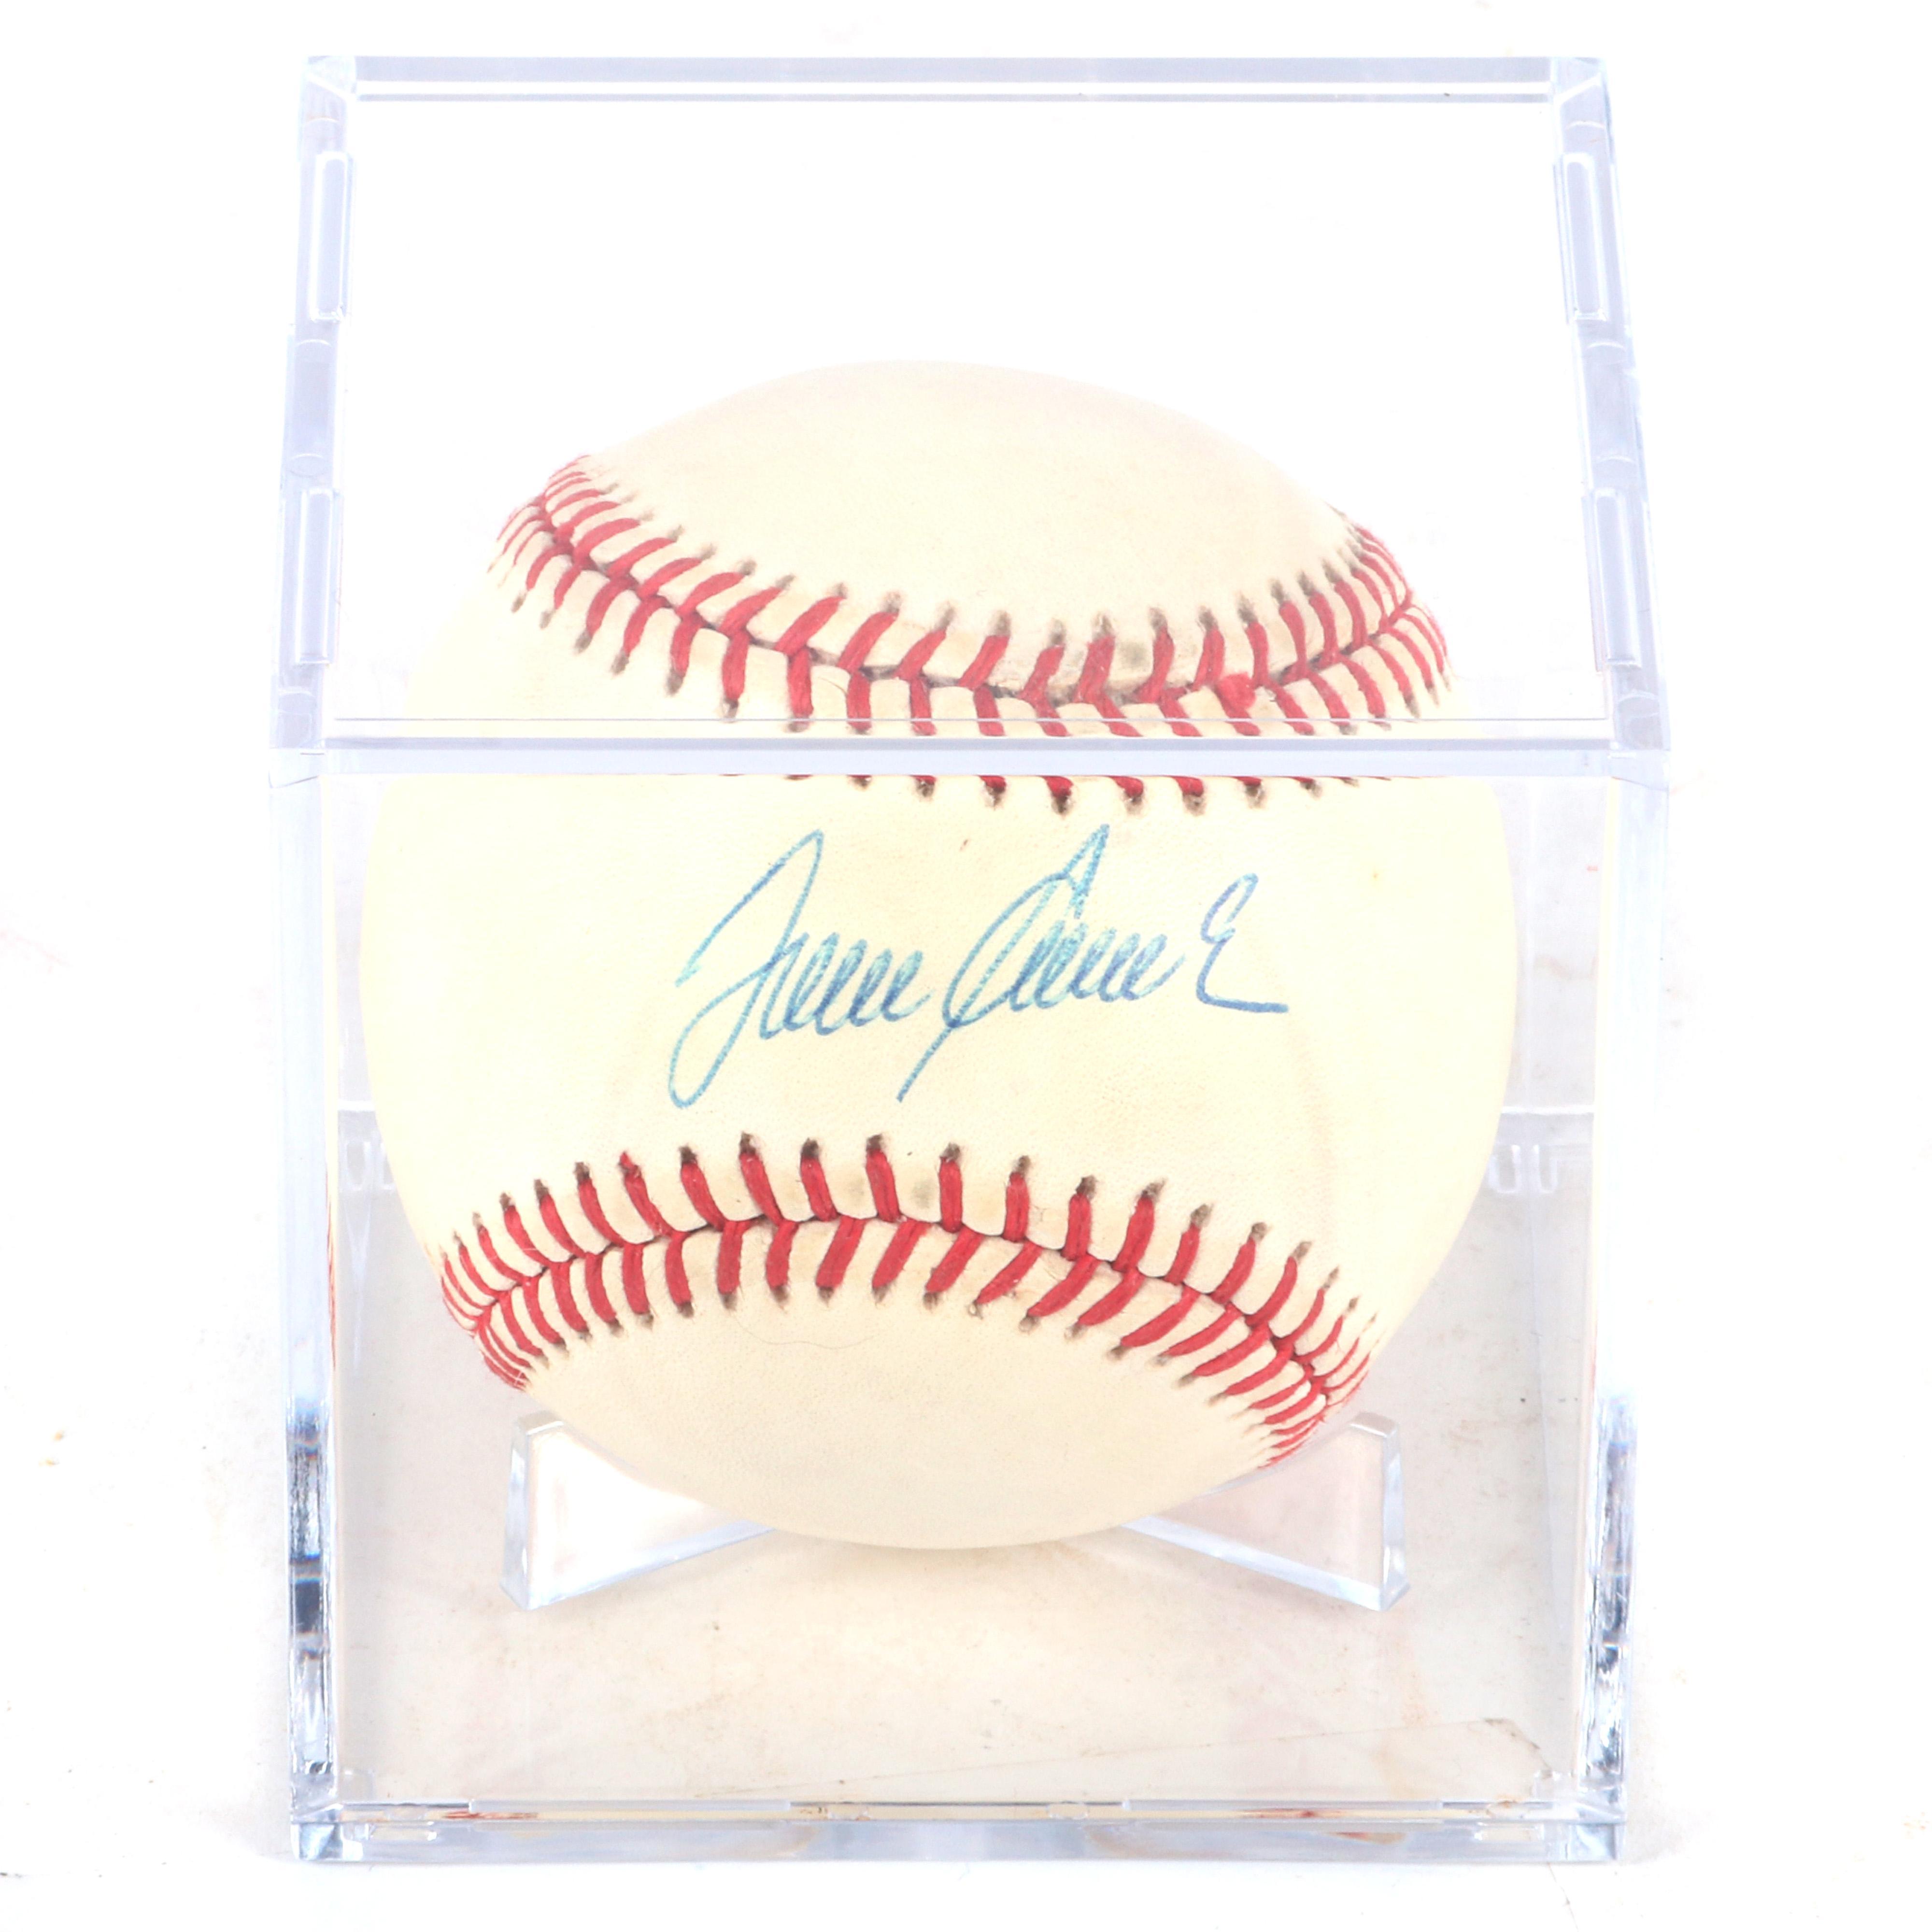 Tom Seaver Autographed Baseball